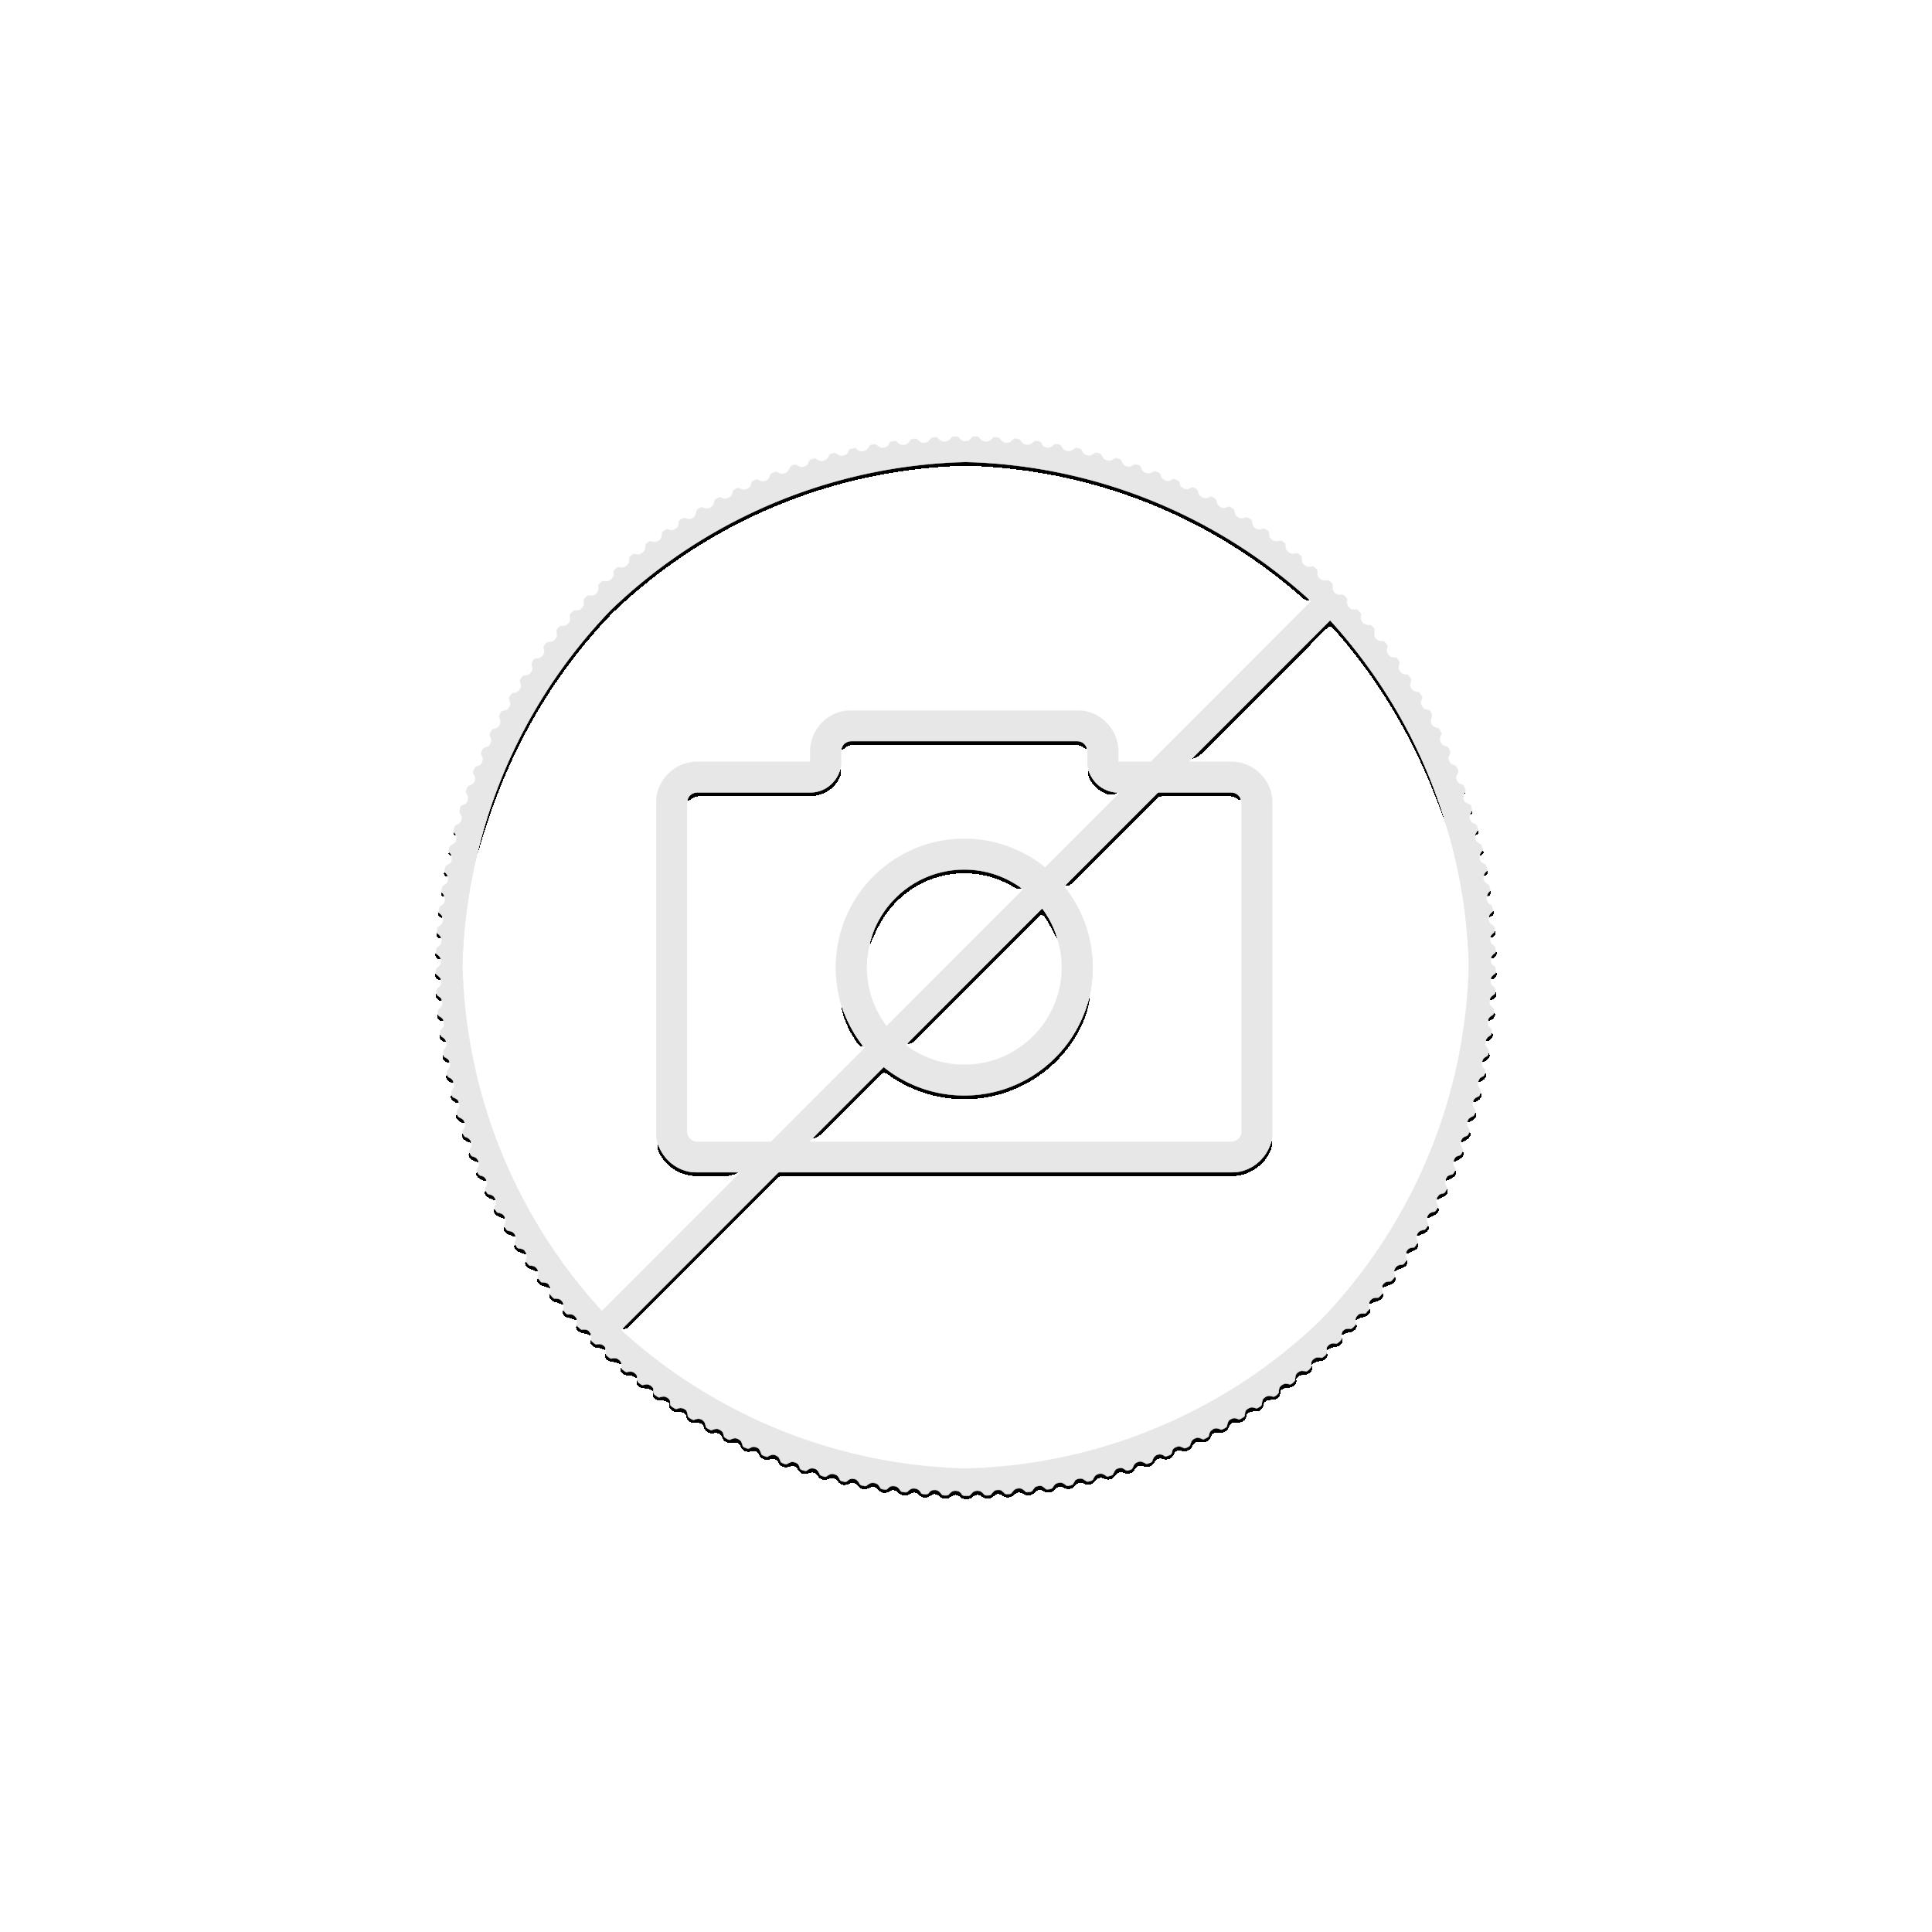 2 troy ounce gouden munt mythen en legendes dragon 2021 Proof - achterkant